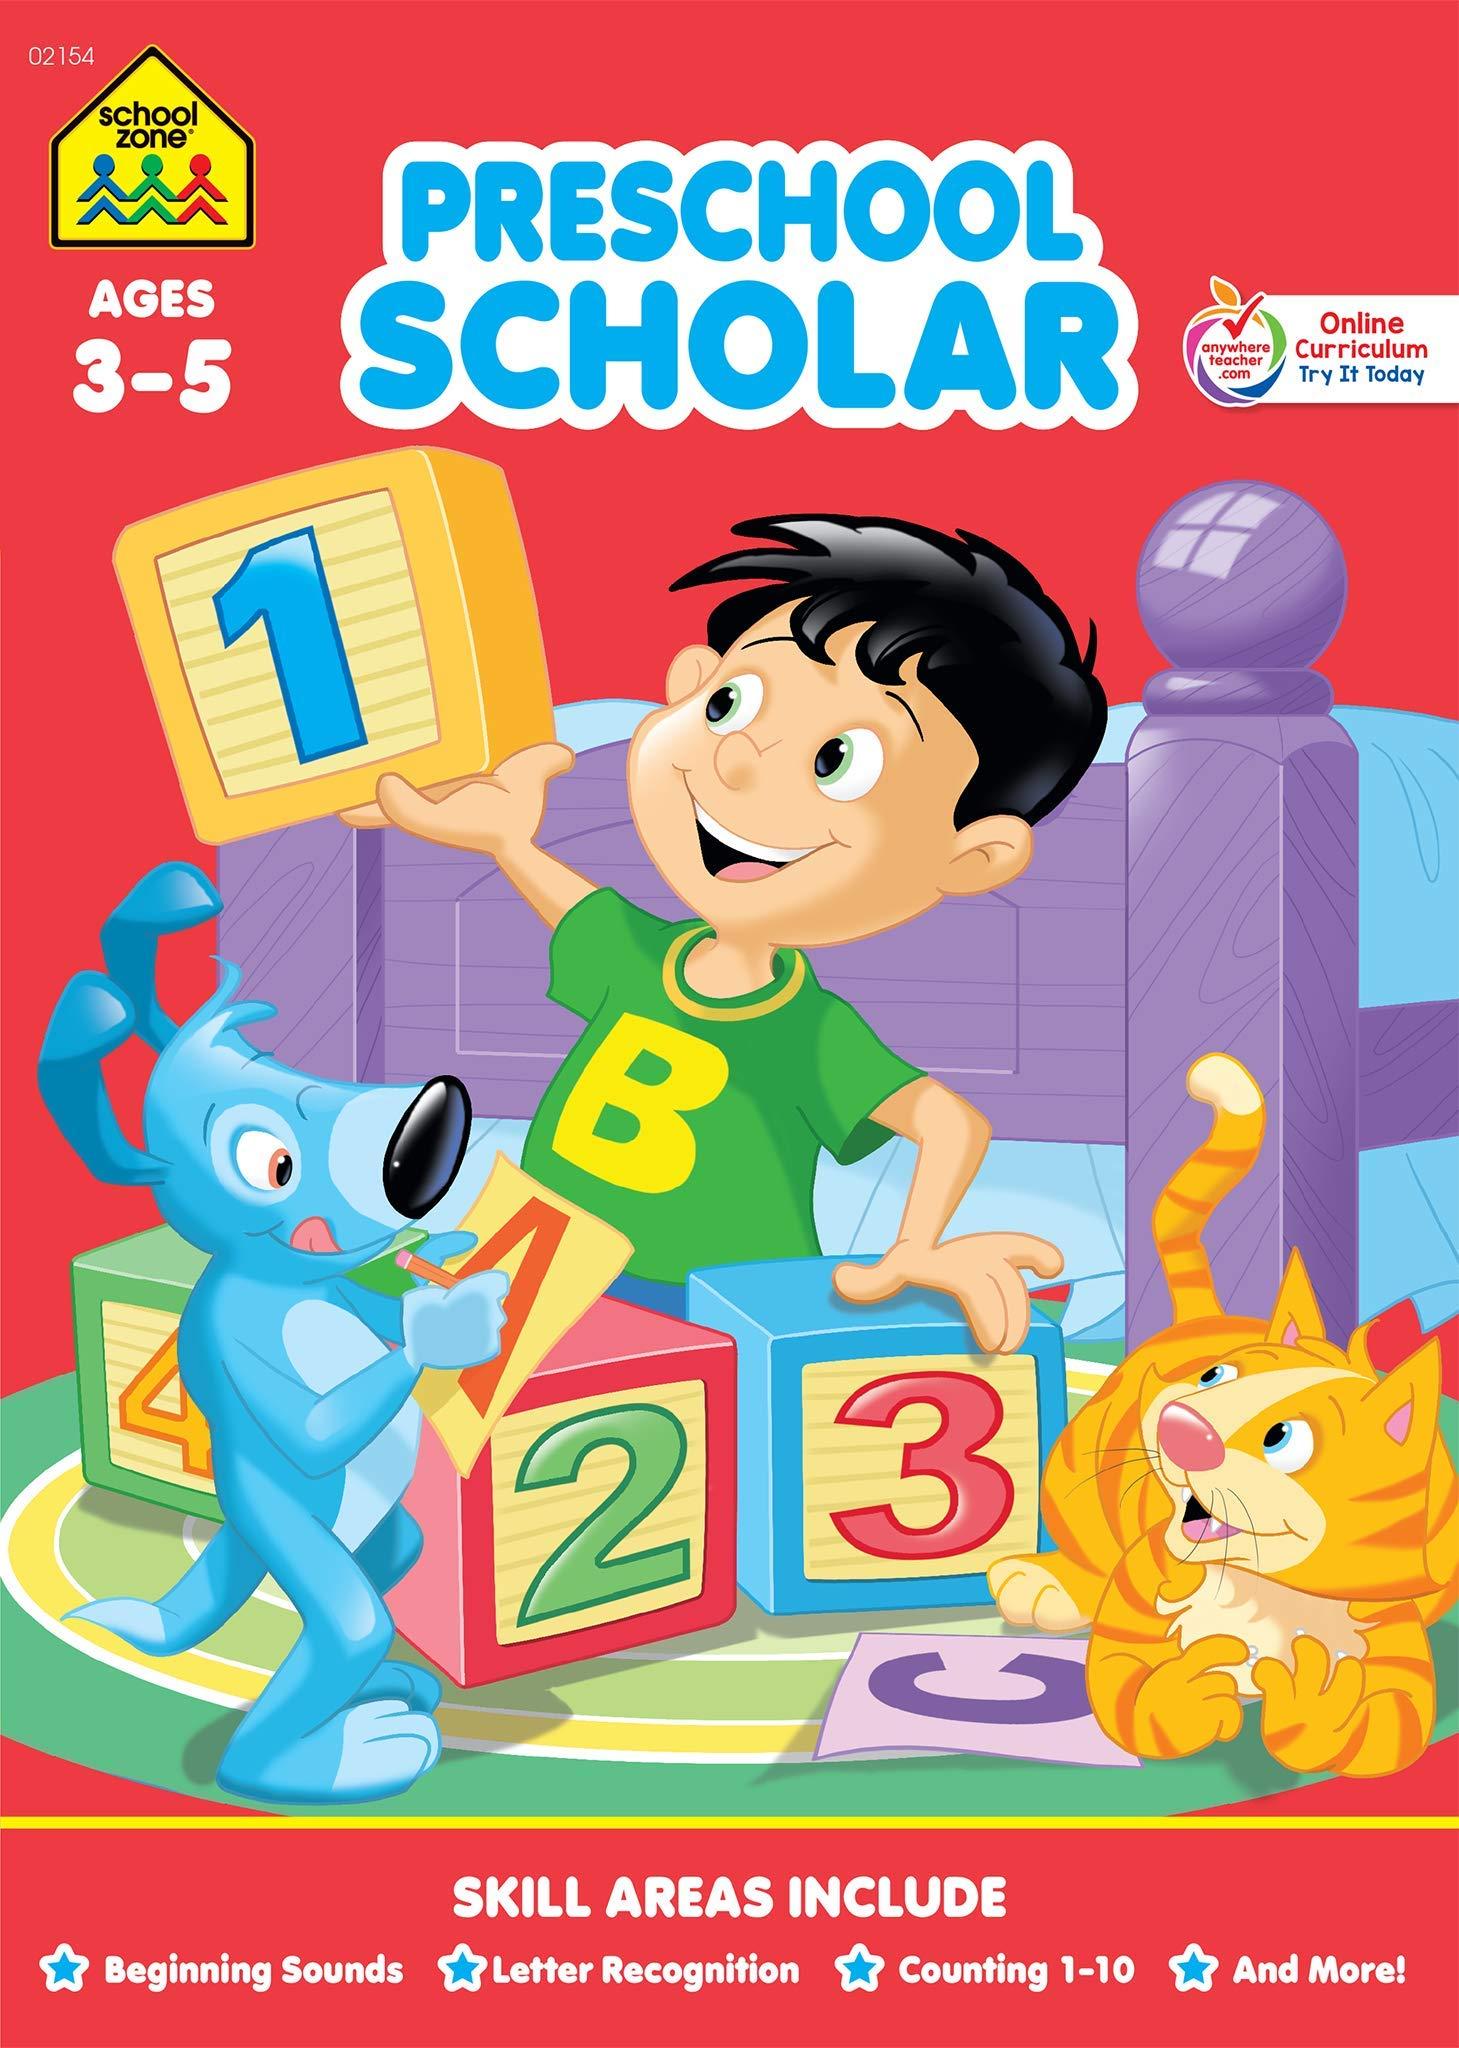 Textbook Clipart Preschool Book Textbook Preschool Book